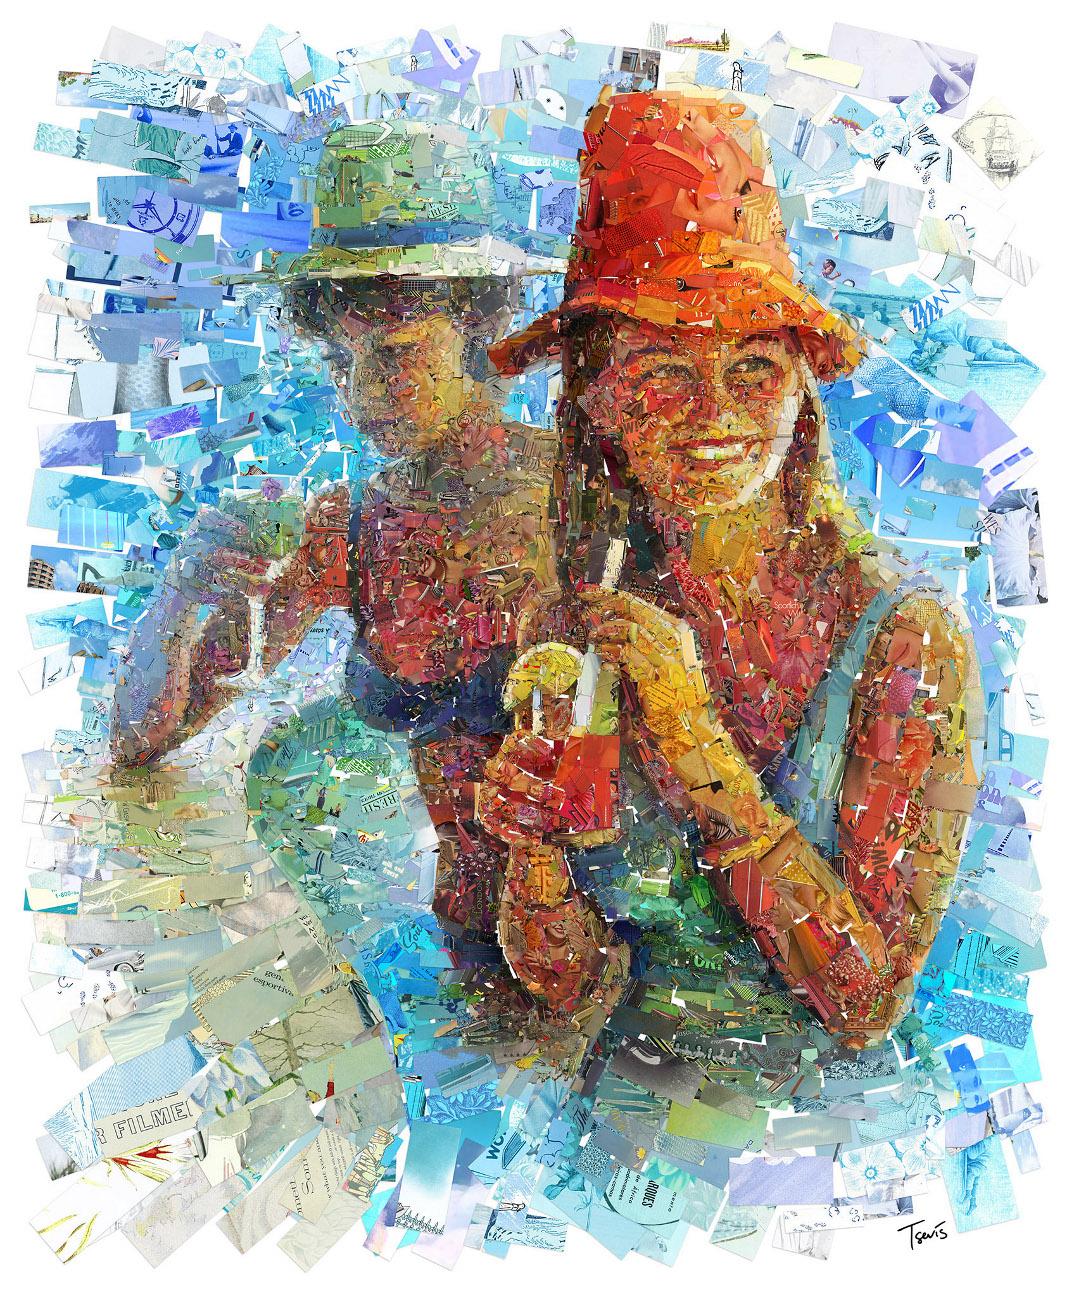 mosaici-collage-riviste-anni-50-60-endless-summer-charis-tsevis-08